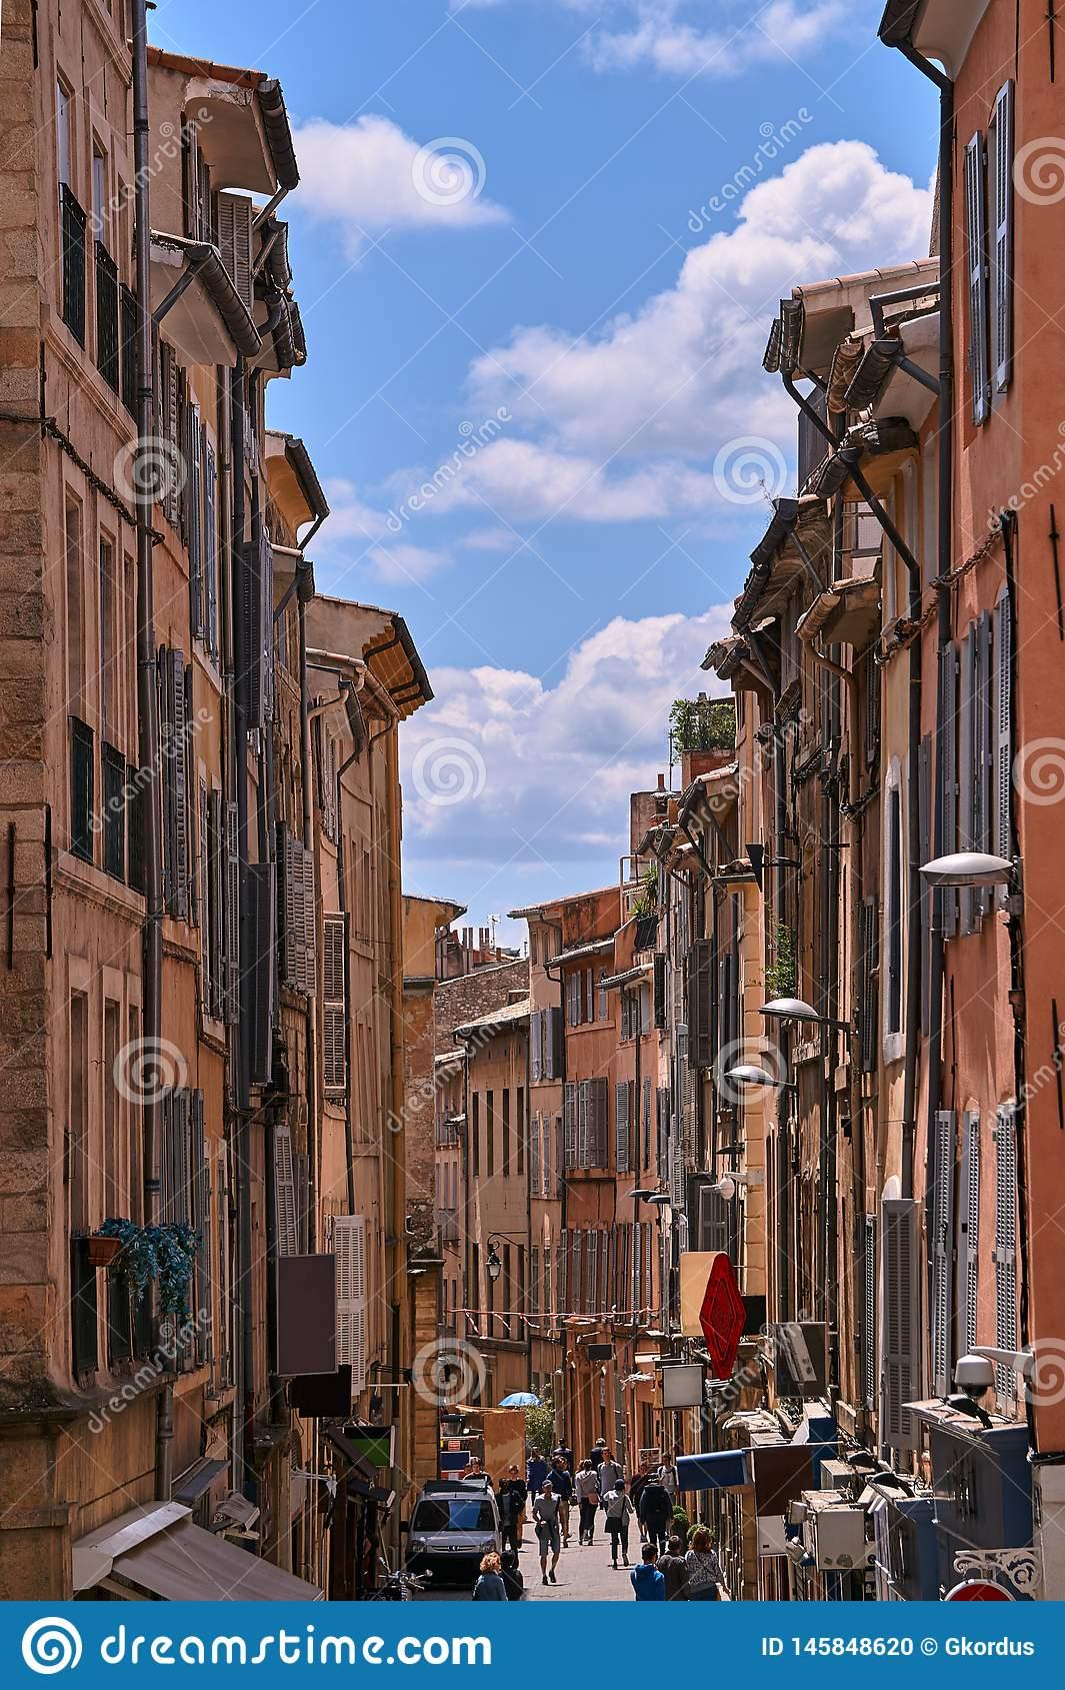 Bunk houses on a narrow street